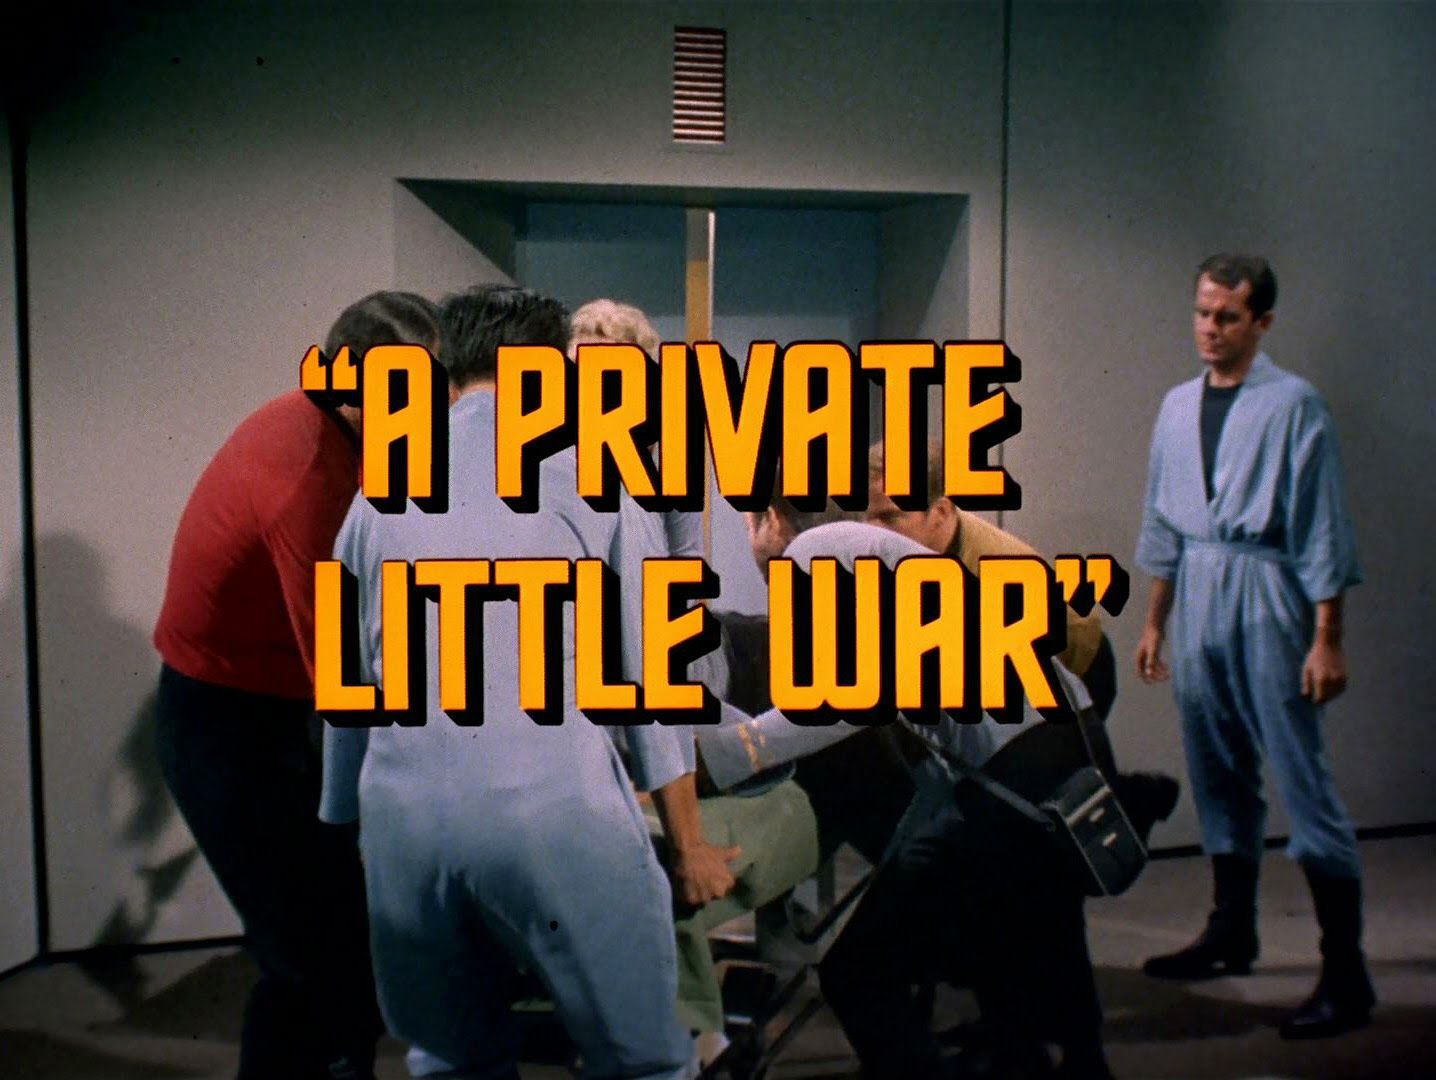 private little war title